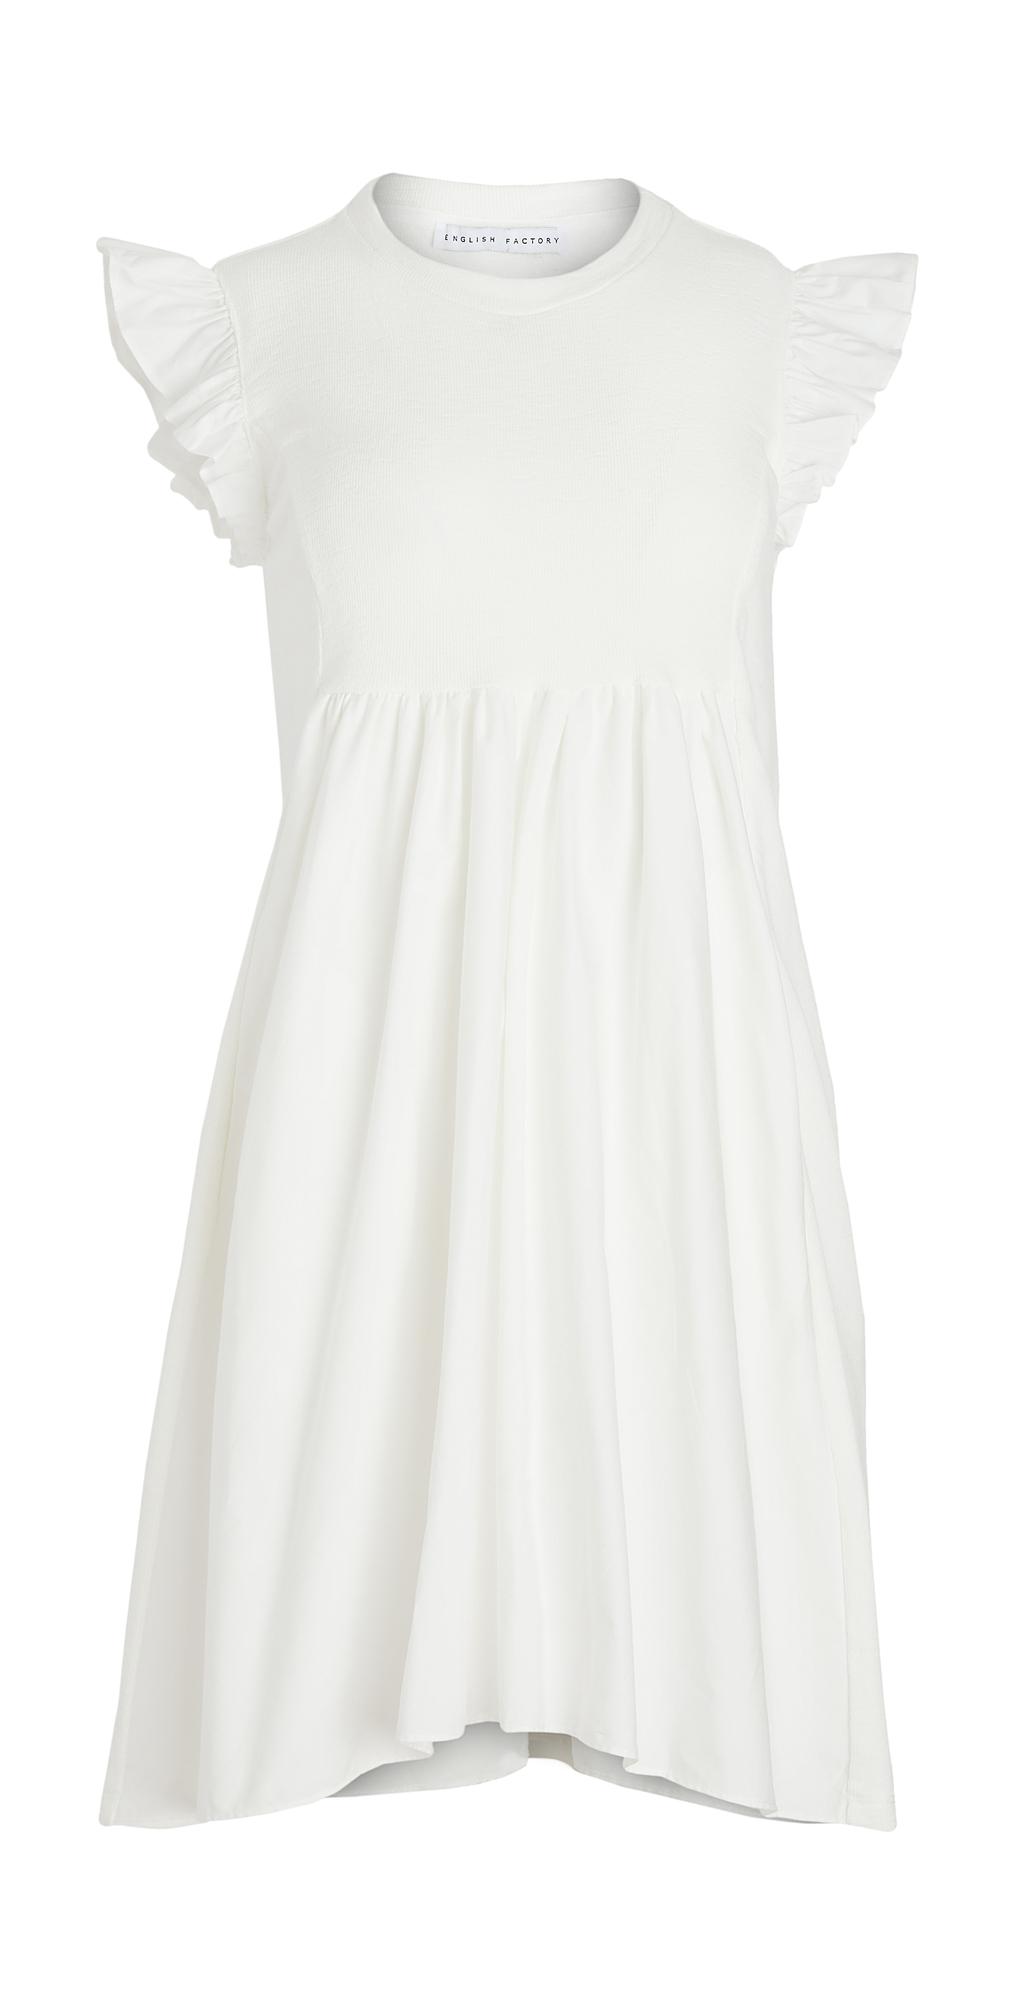 ENGLISH FACTORY Knit Poplin Mixed Dress